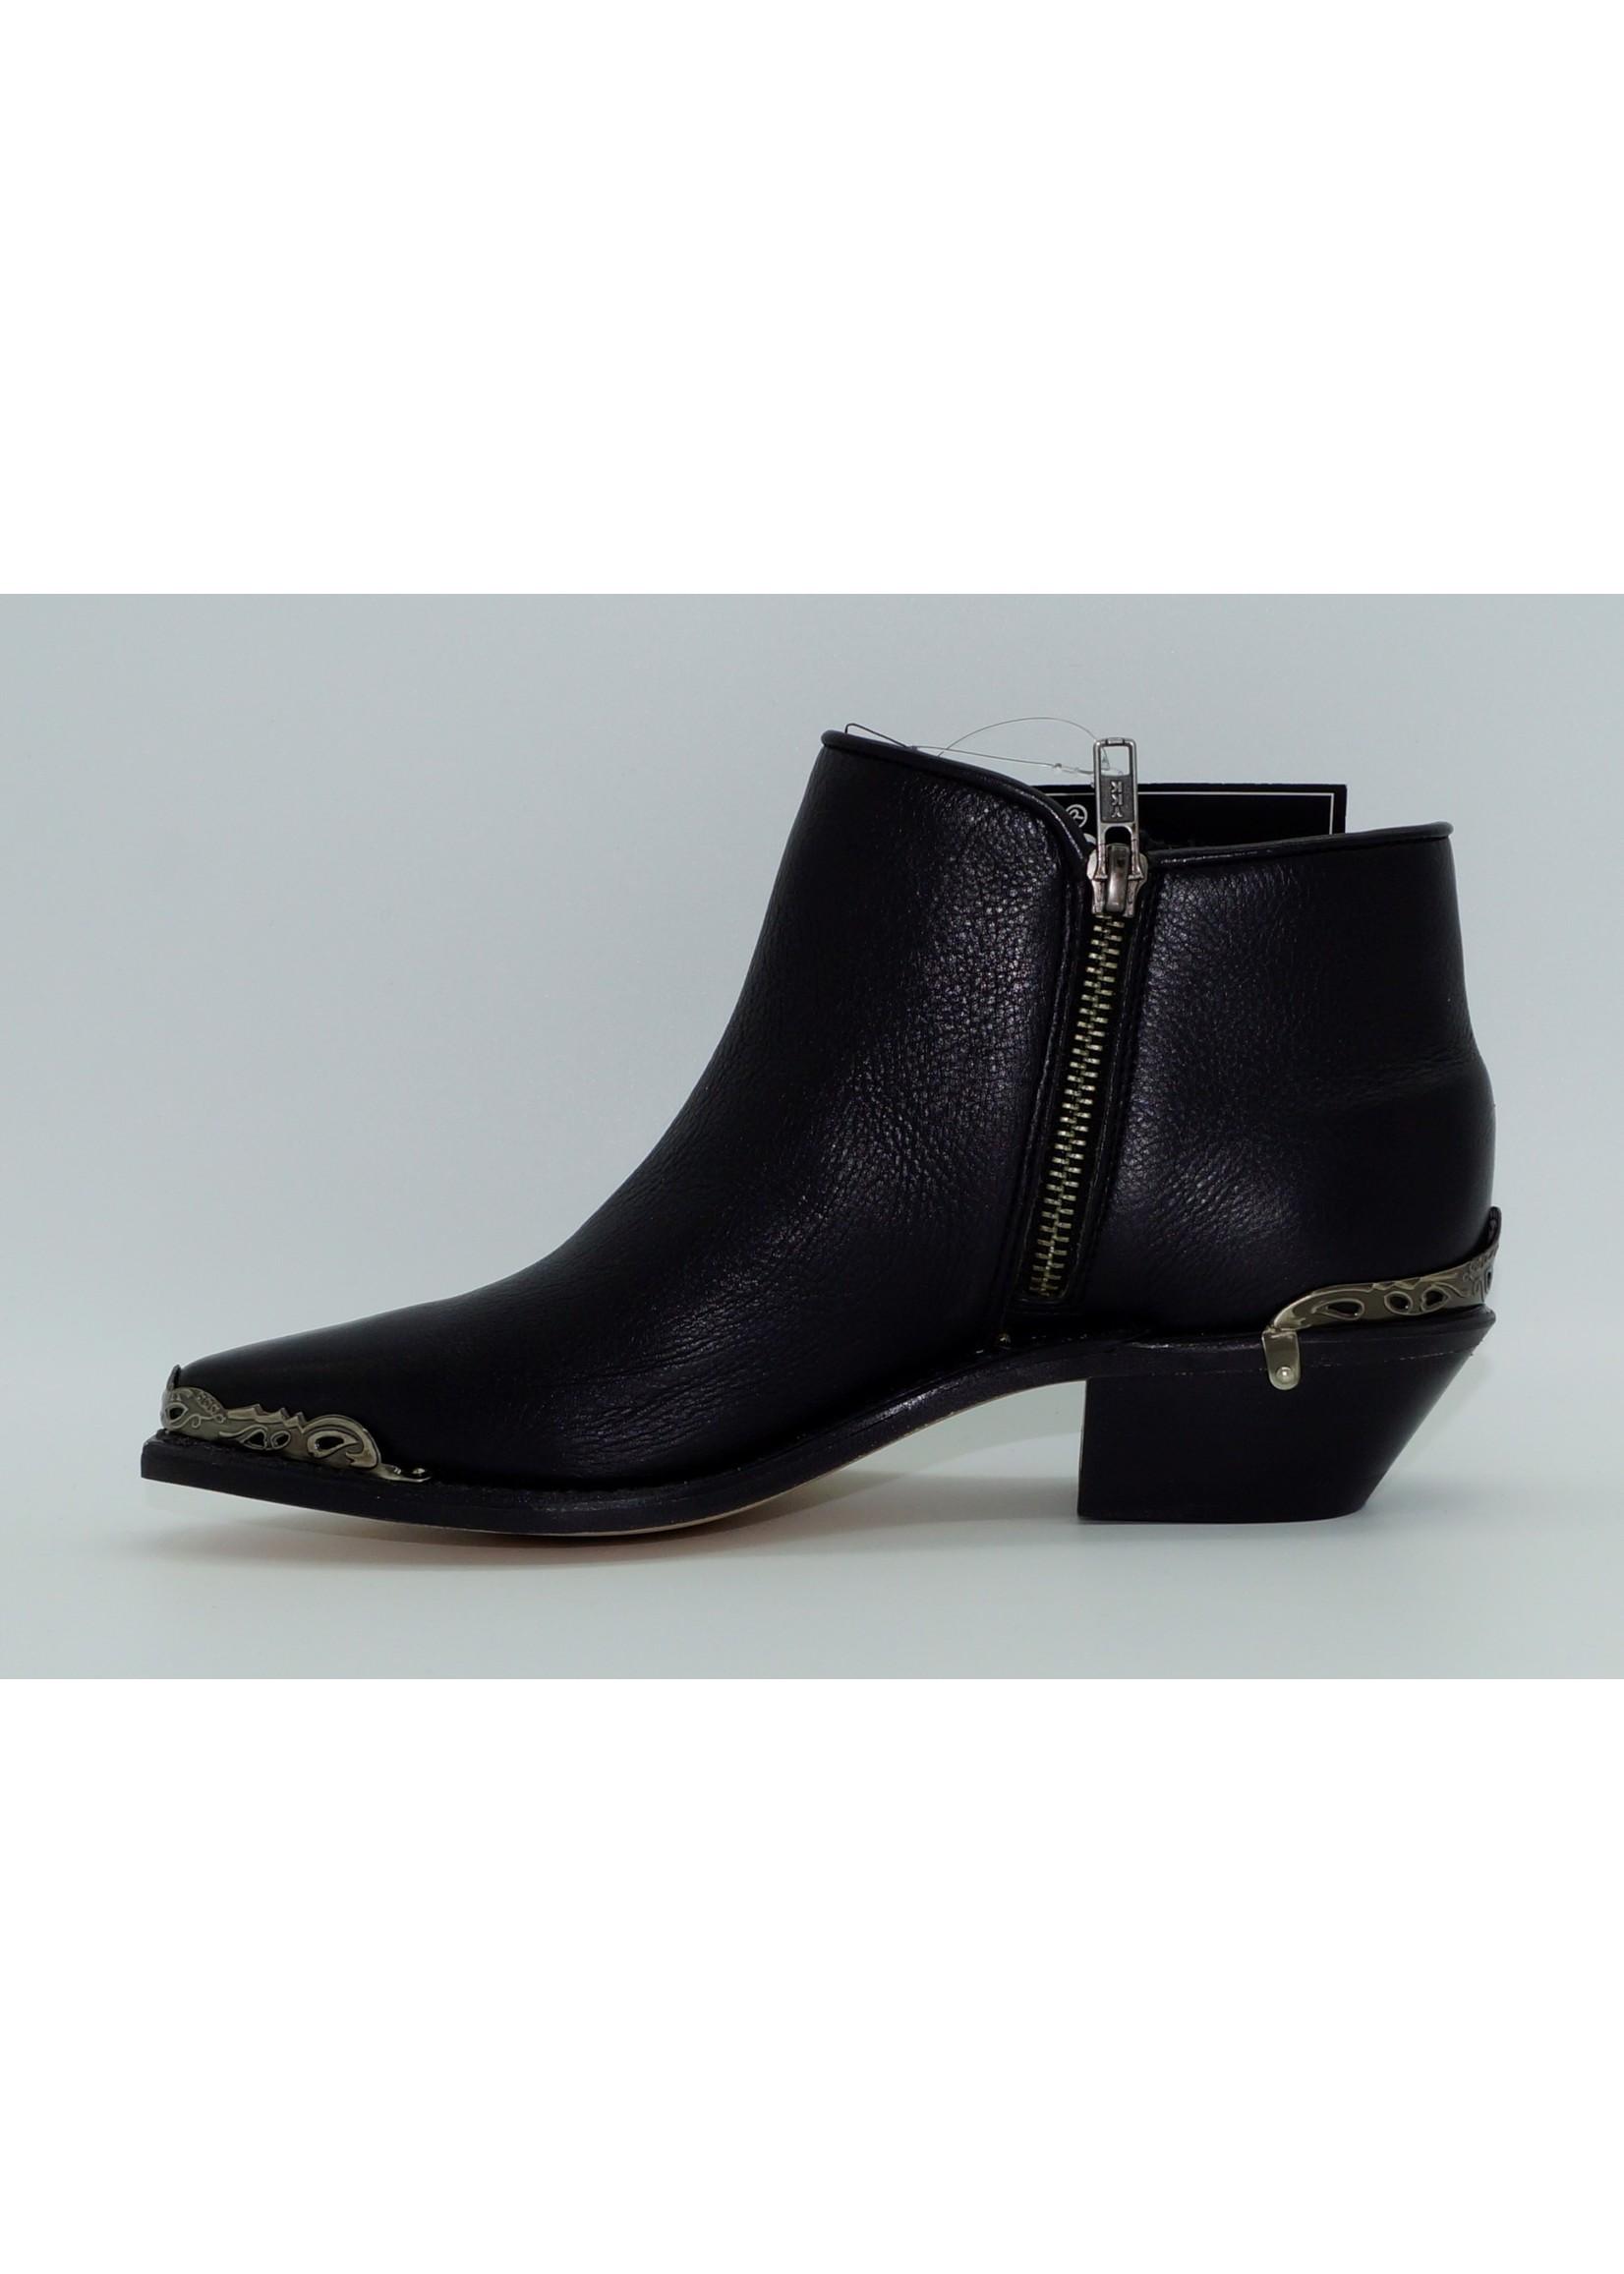 Sage Women's Black Snip Toe Demi-Boots 4565